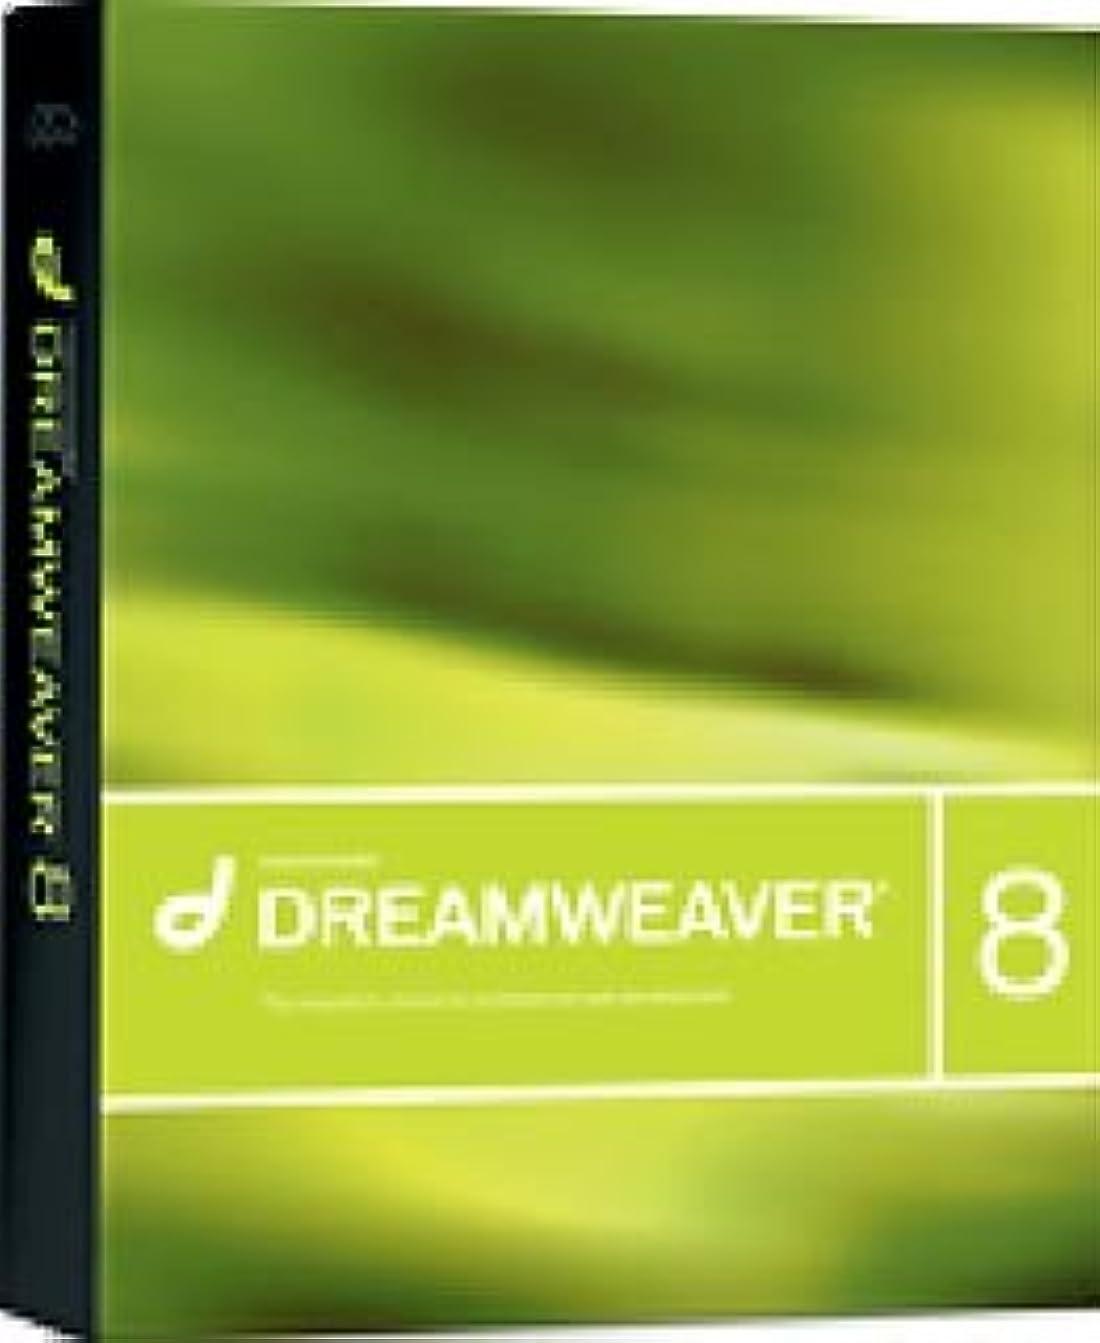 Dreamweaver 8 日本語版 アップグレード版